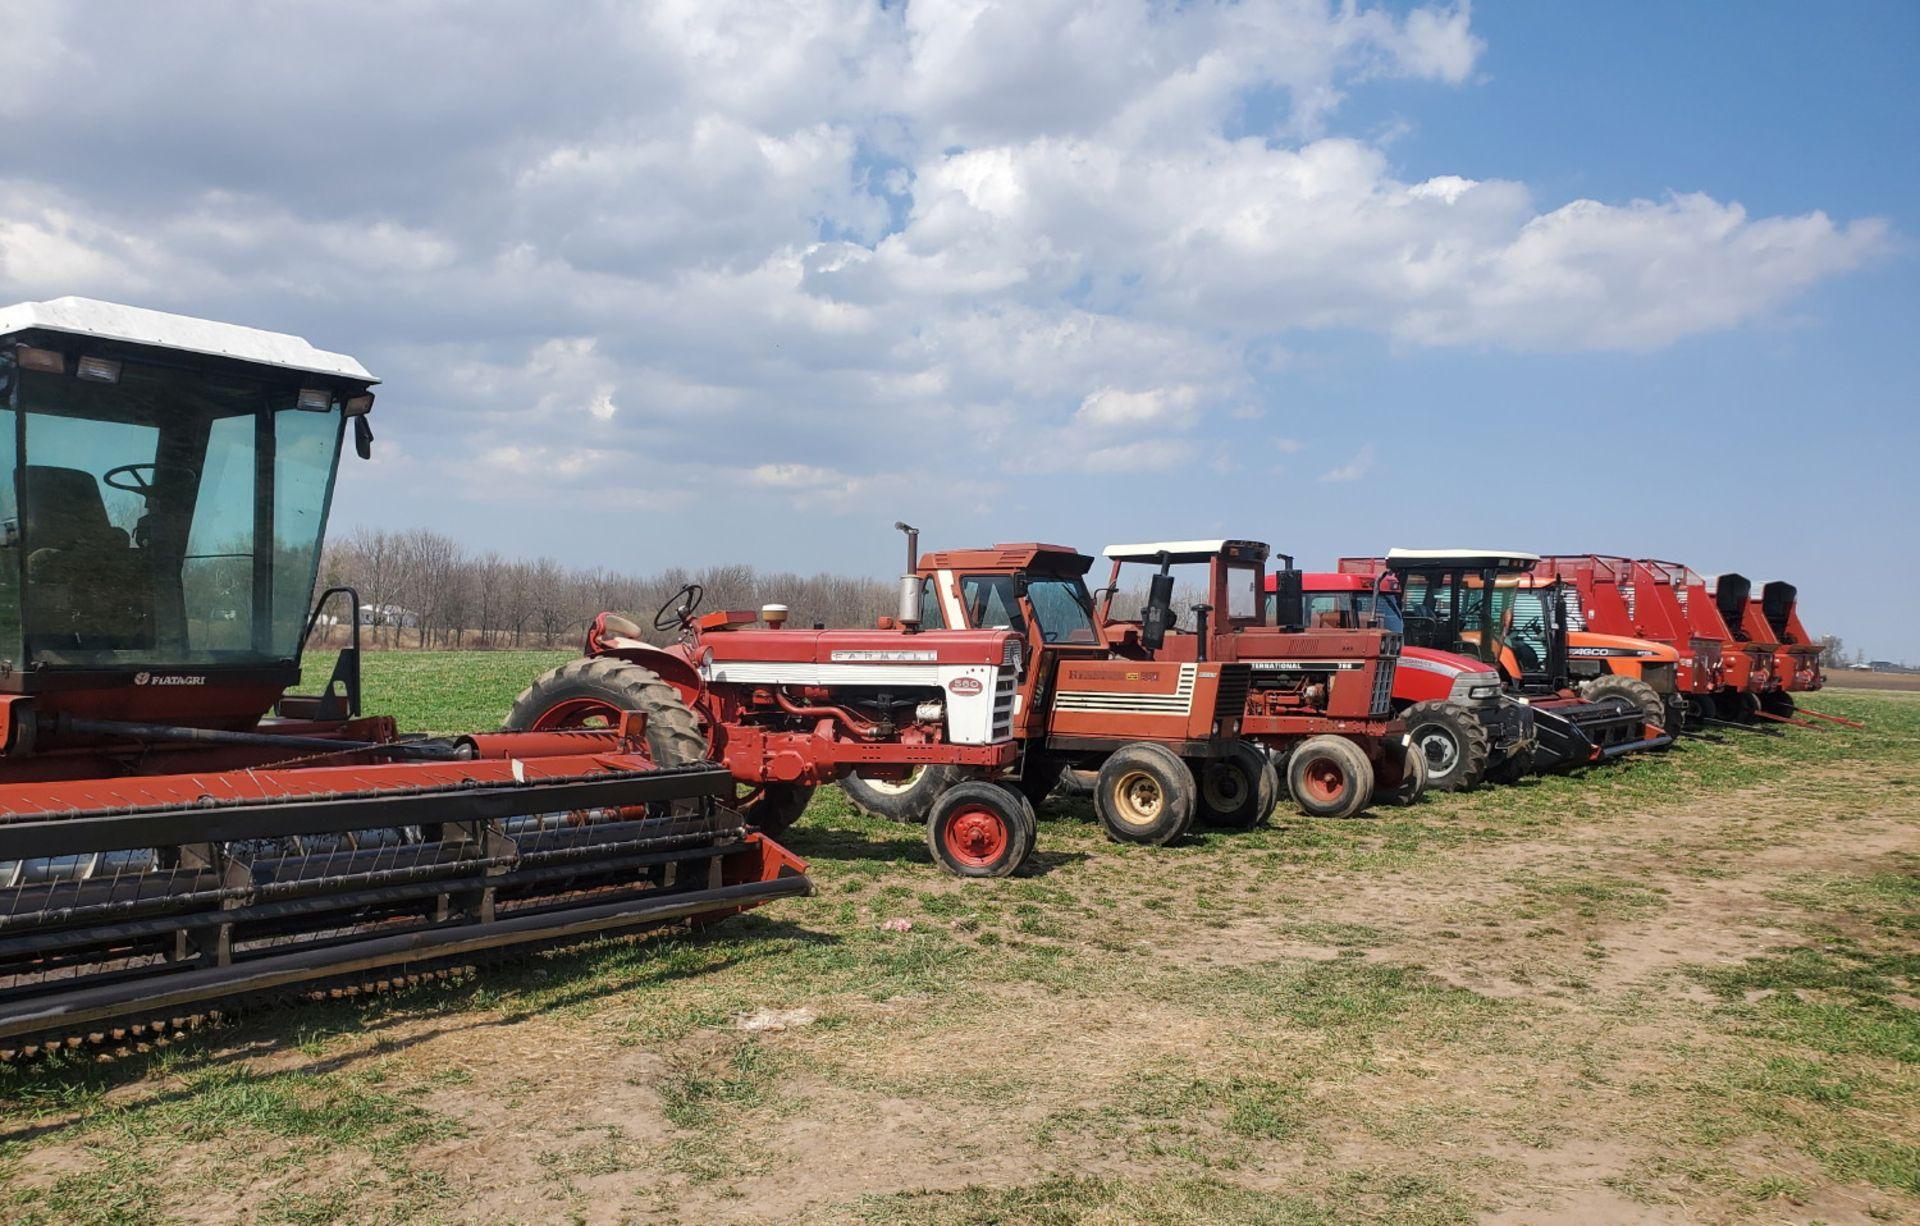 R.L Jersey Dairy Farms Retirement Auction, Thursday, April 8, 2021 10:00 a.m. Selling…complete - Image 3 of 3